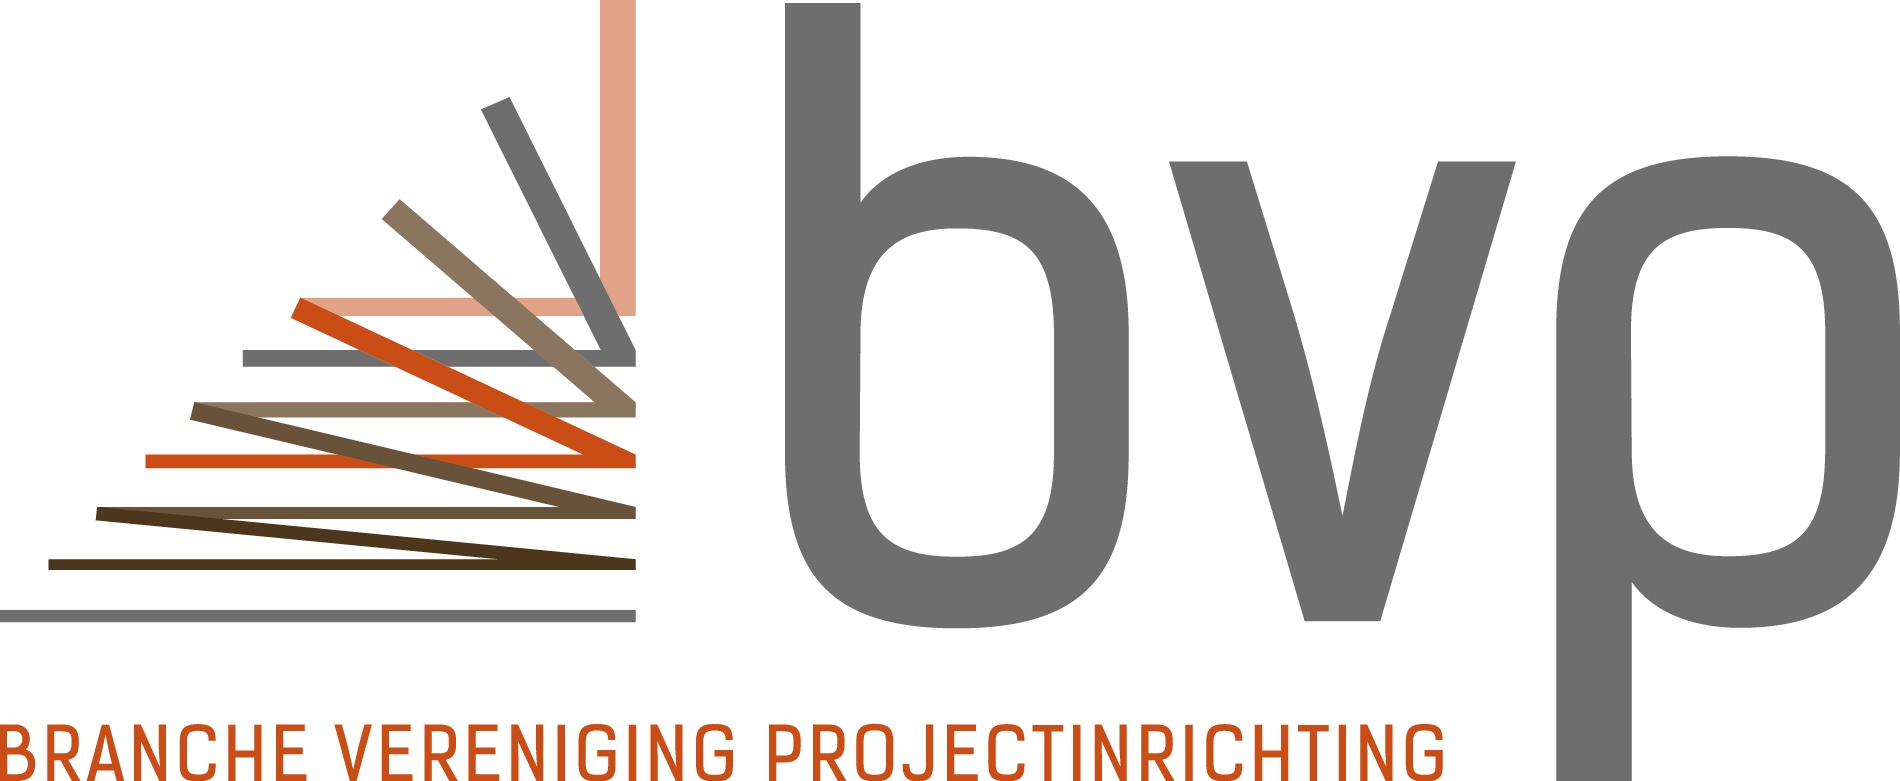 BVP1-Logo-2015-FC-defzGVtnaSwSD4Ss